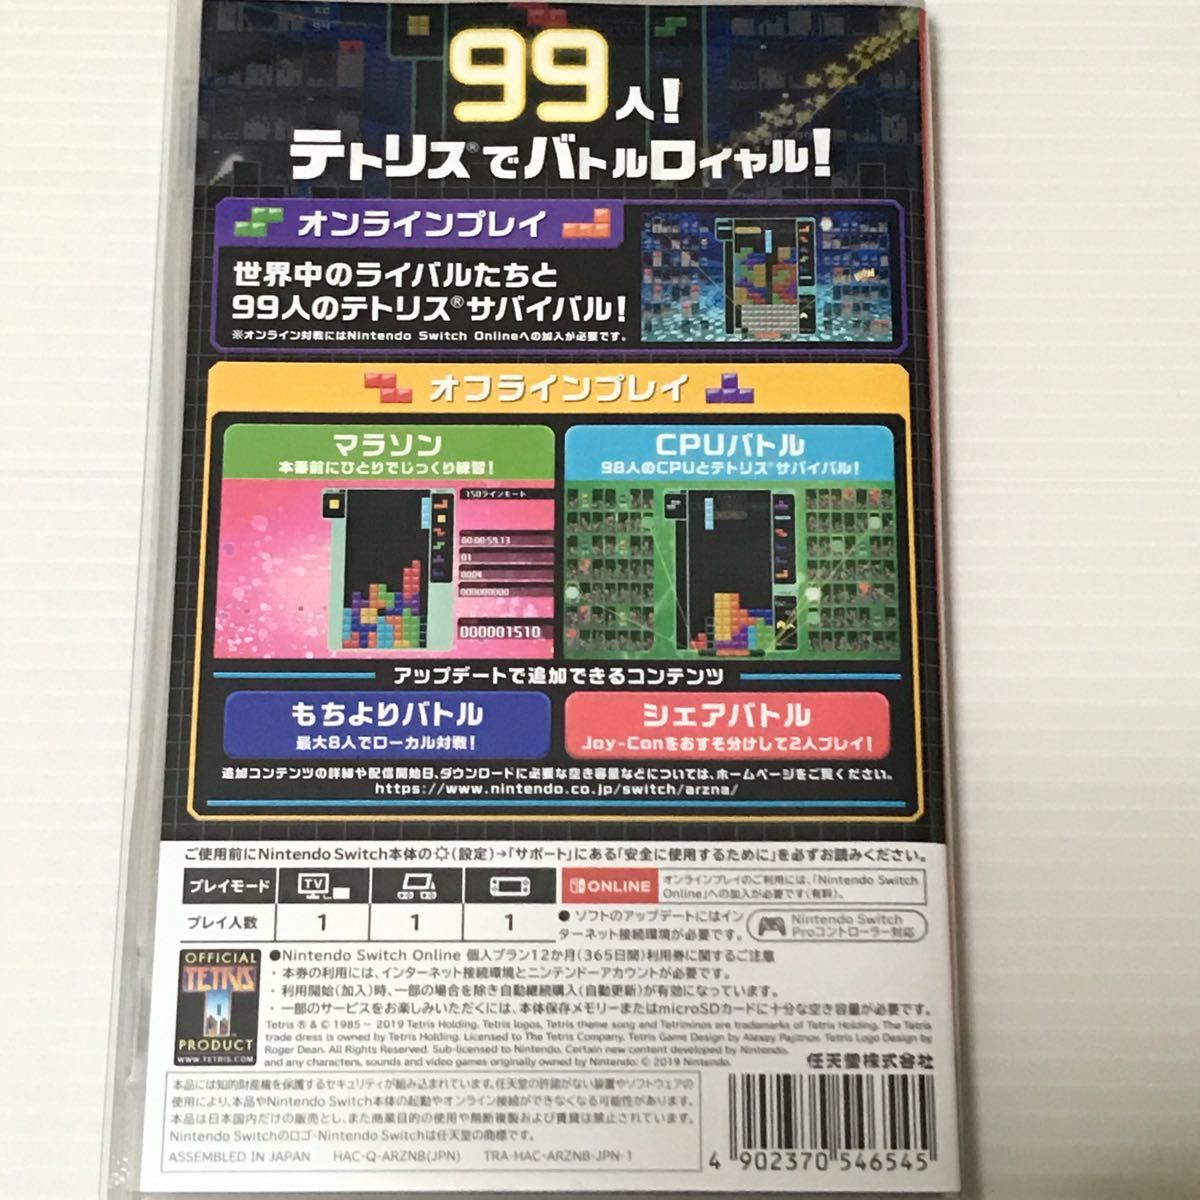 Switch ソフト テトリス 99 パッケージ版 ★オンライン利用券なし★